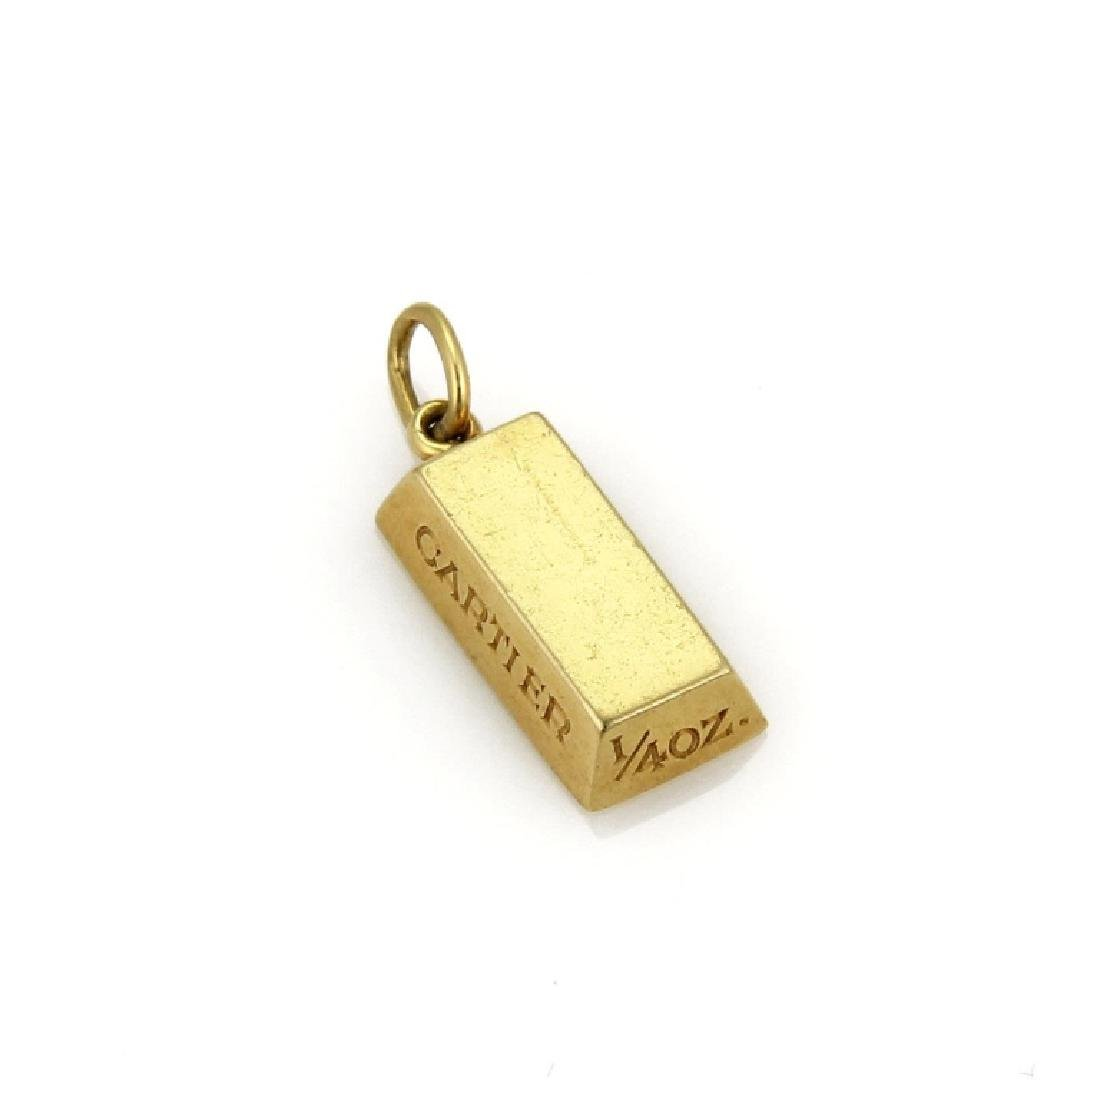 d033908b7461e Cartier 1/4 oz. 18k Gold Ingot Bar Charm Pendant